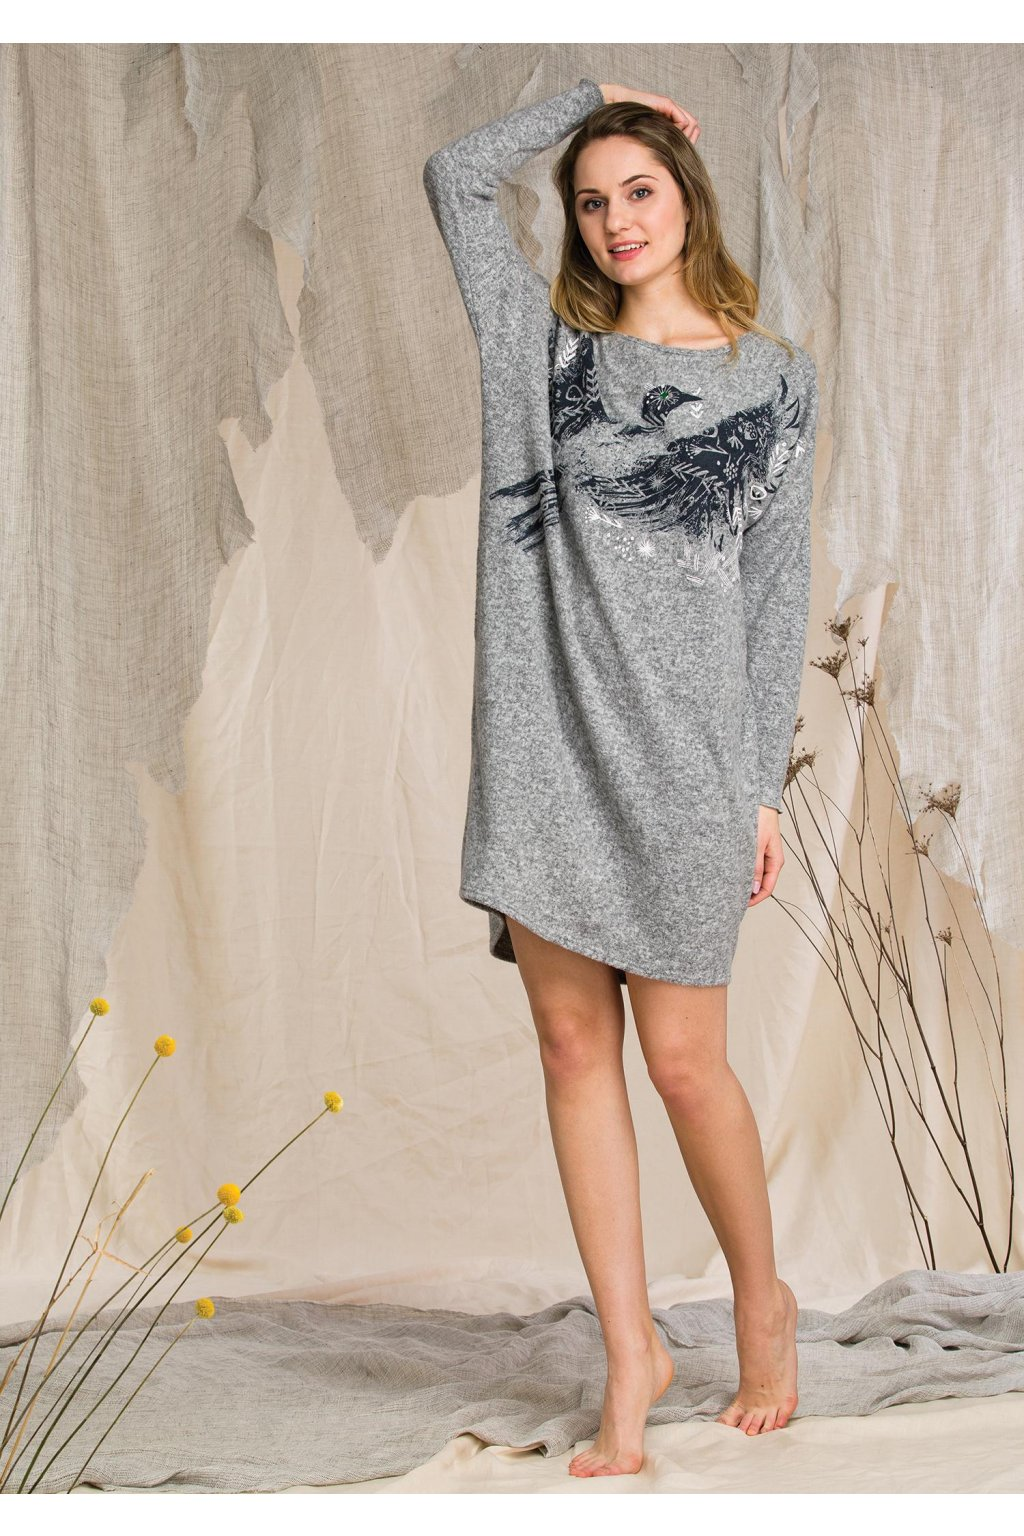 sweterkowa sukienka homewear z grafika ptaka lhd 211 1